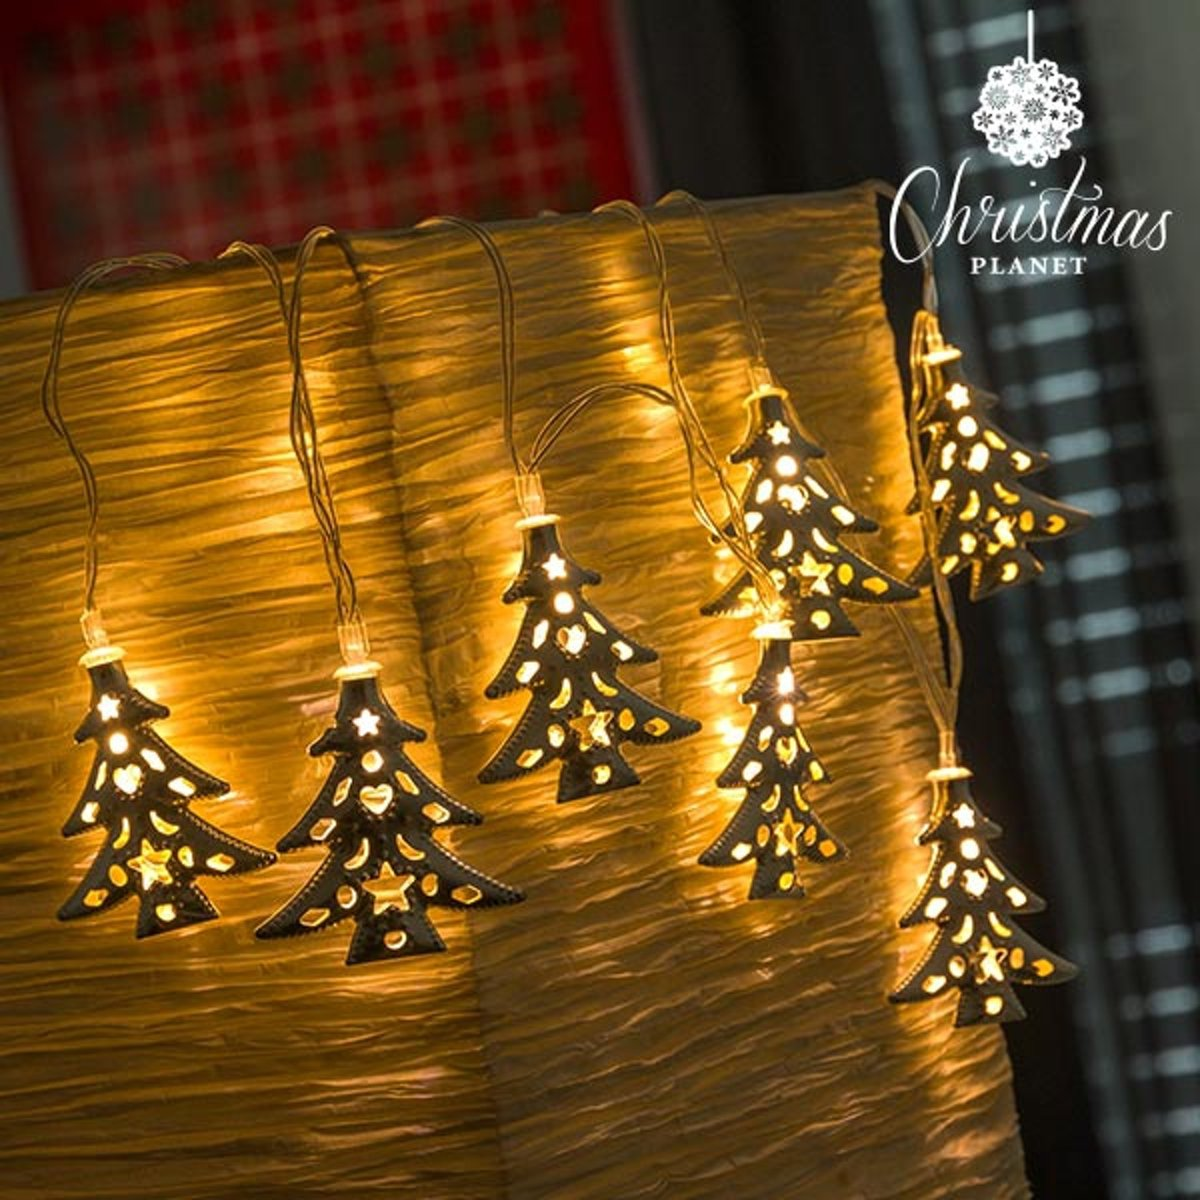 Kerstboom LED Slinger - Met warm licht, 10 Led lampen kopen